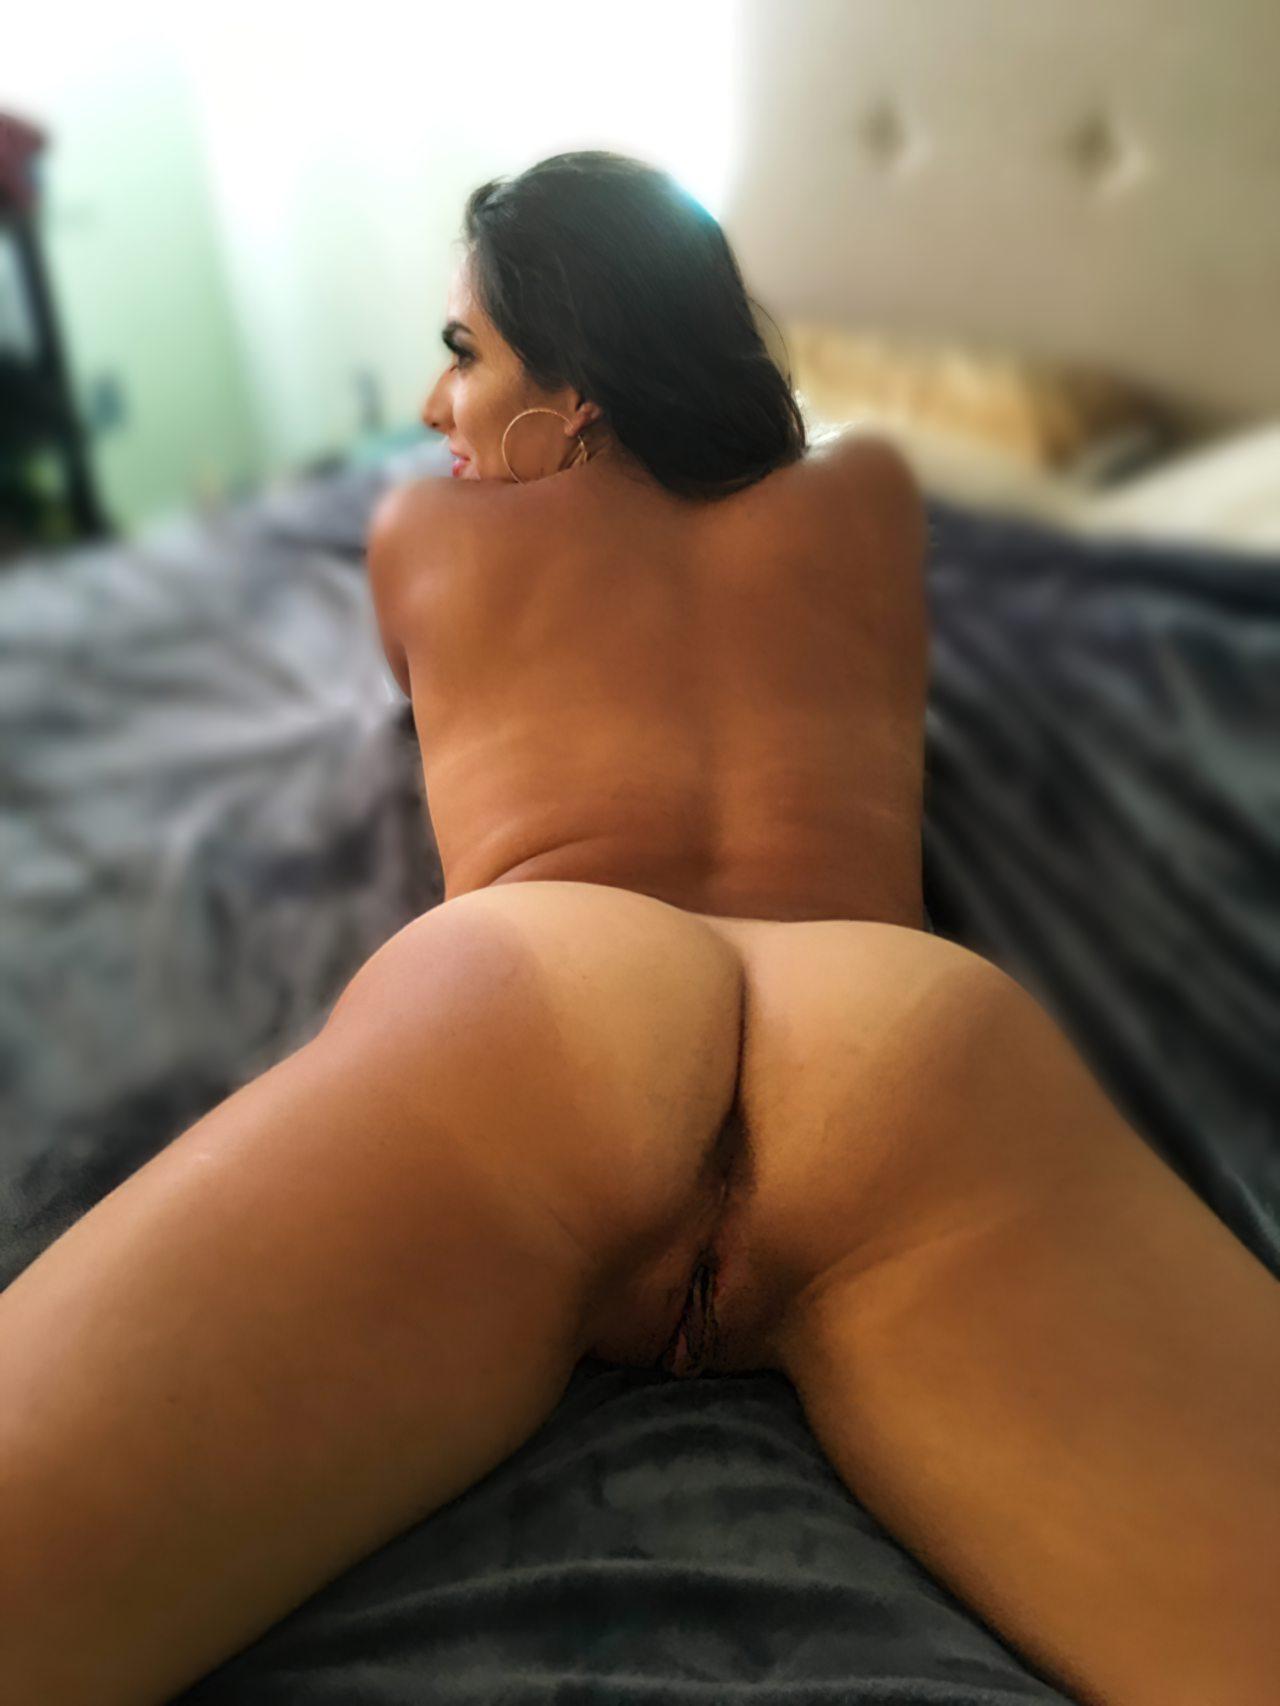 Nudes Amadora Safada (1)